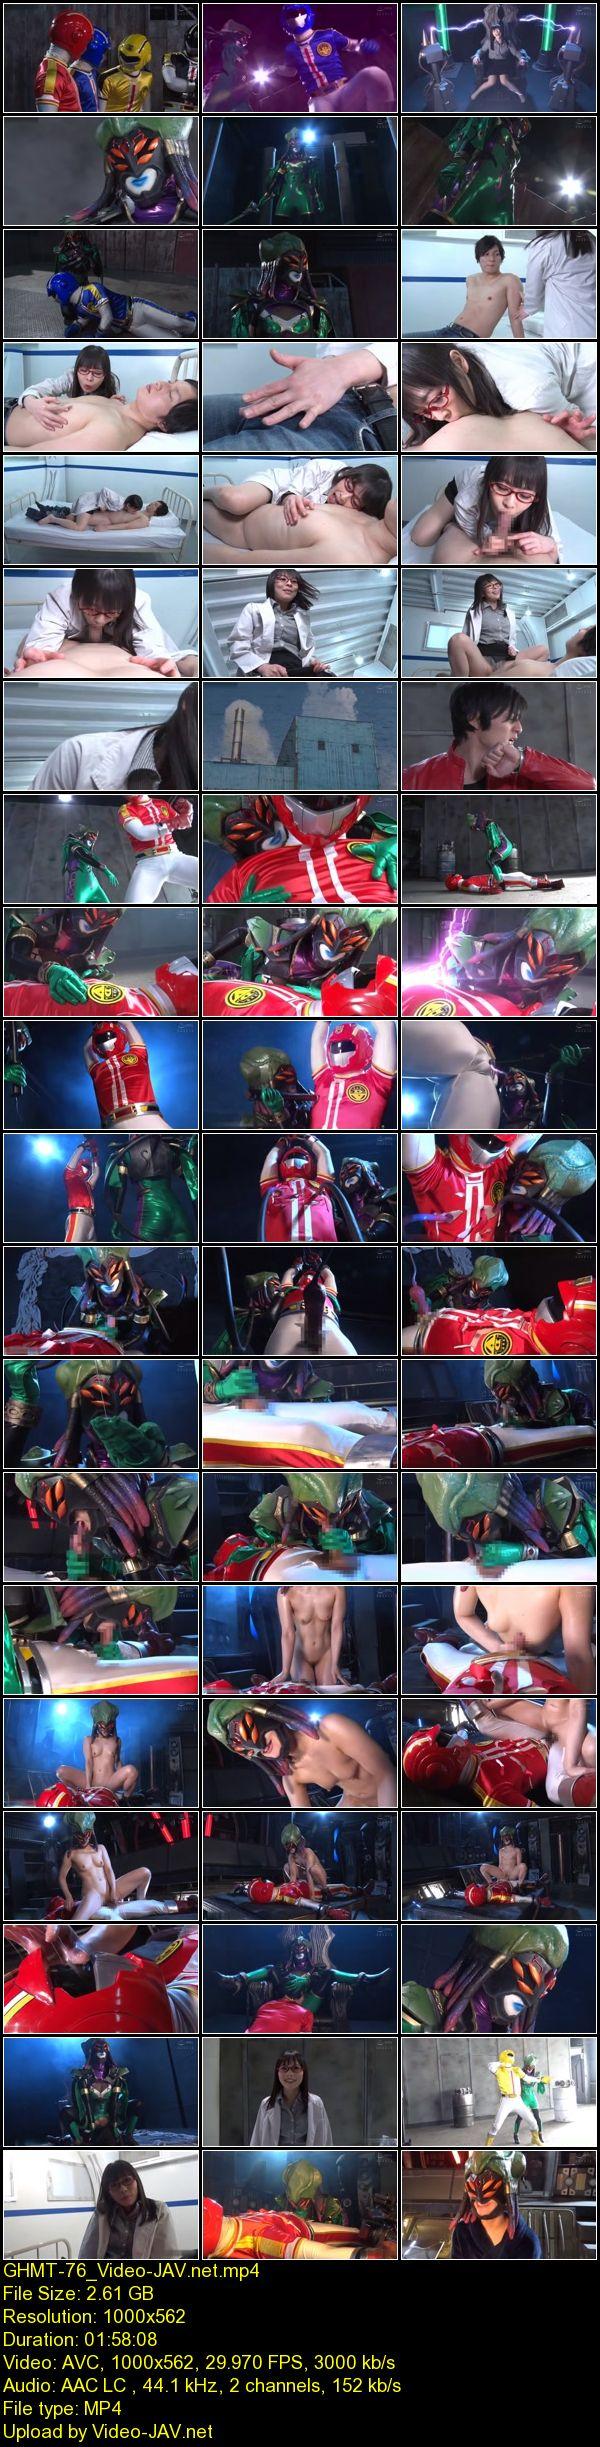 JAV Download Miori Hara [GHMT 76] ヒーロー陥落 魅惑の女怪人ナーシャ 爆裂戦隊タイガマン壊滅作戦 2021 04 15